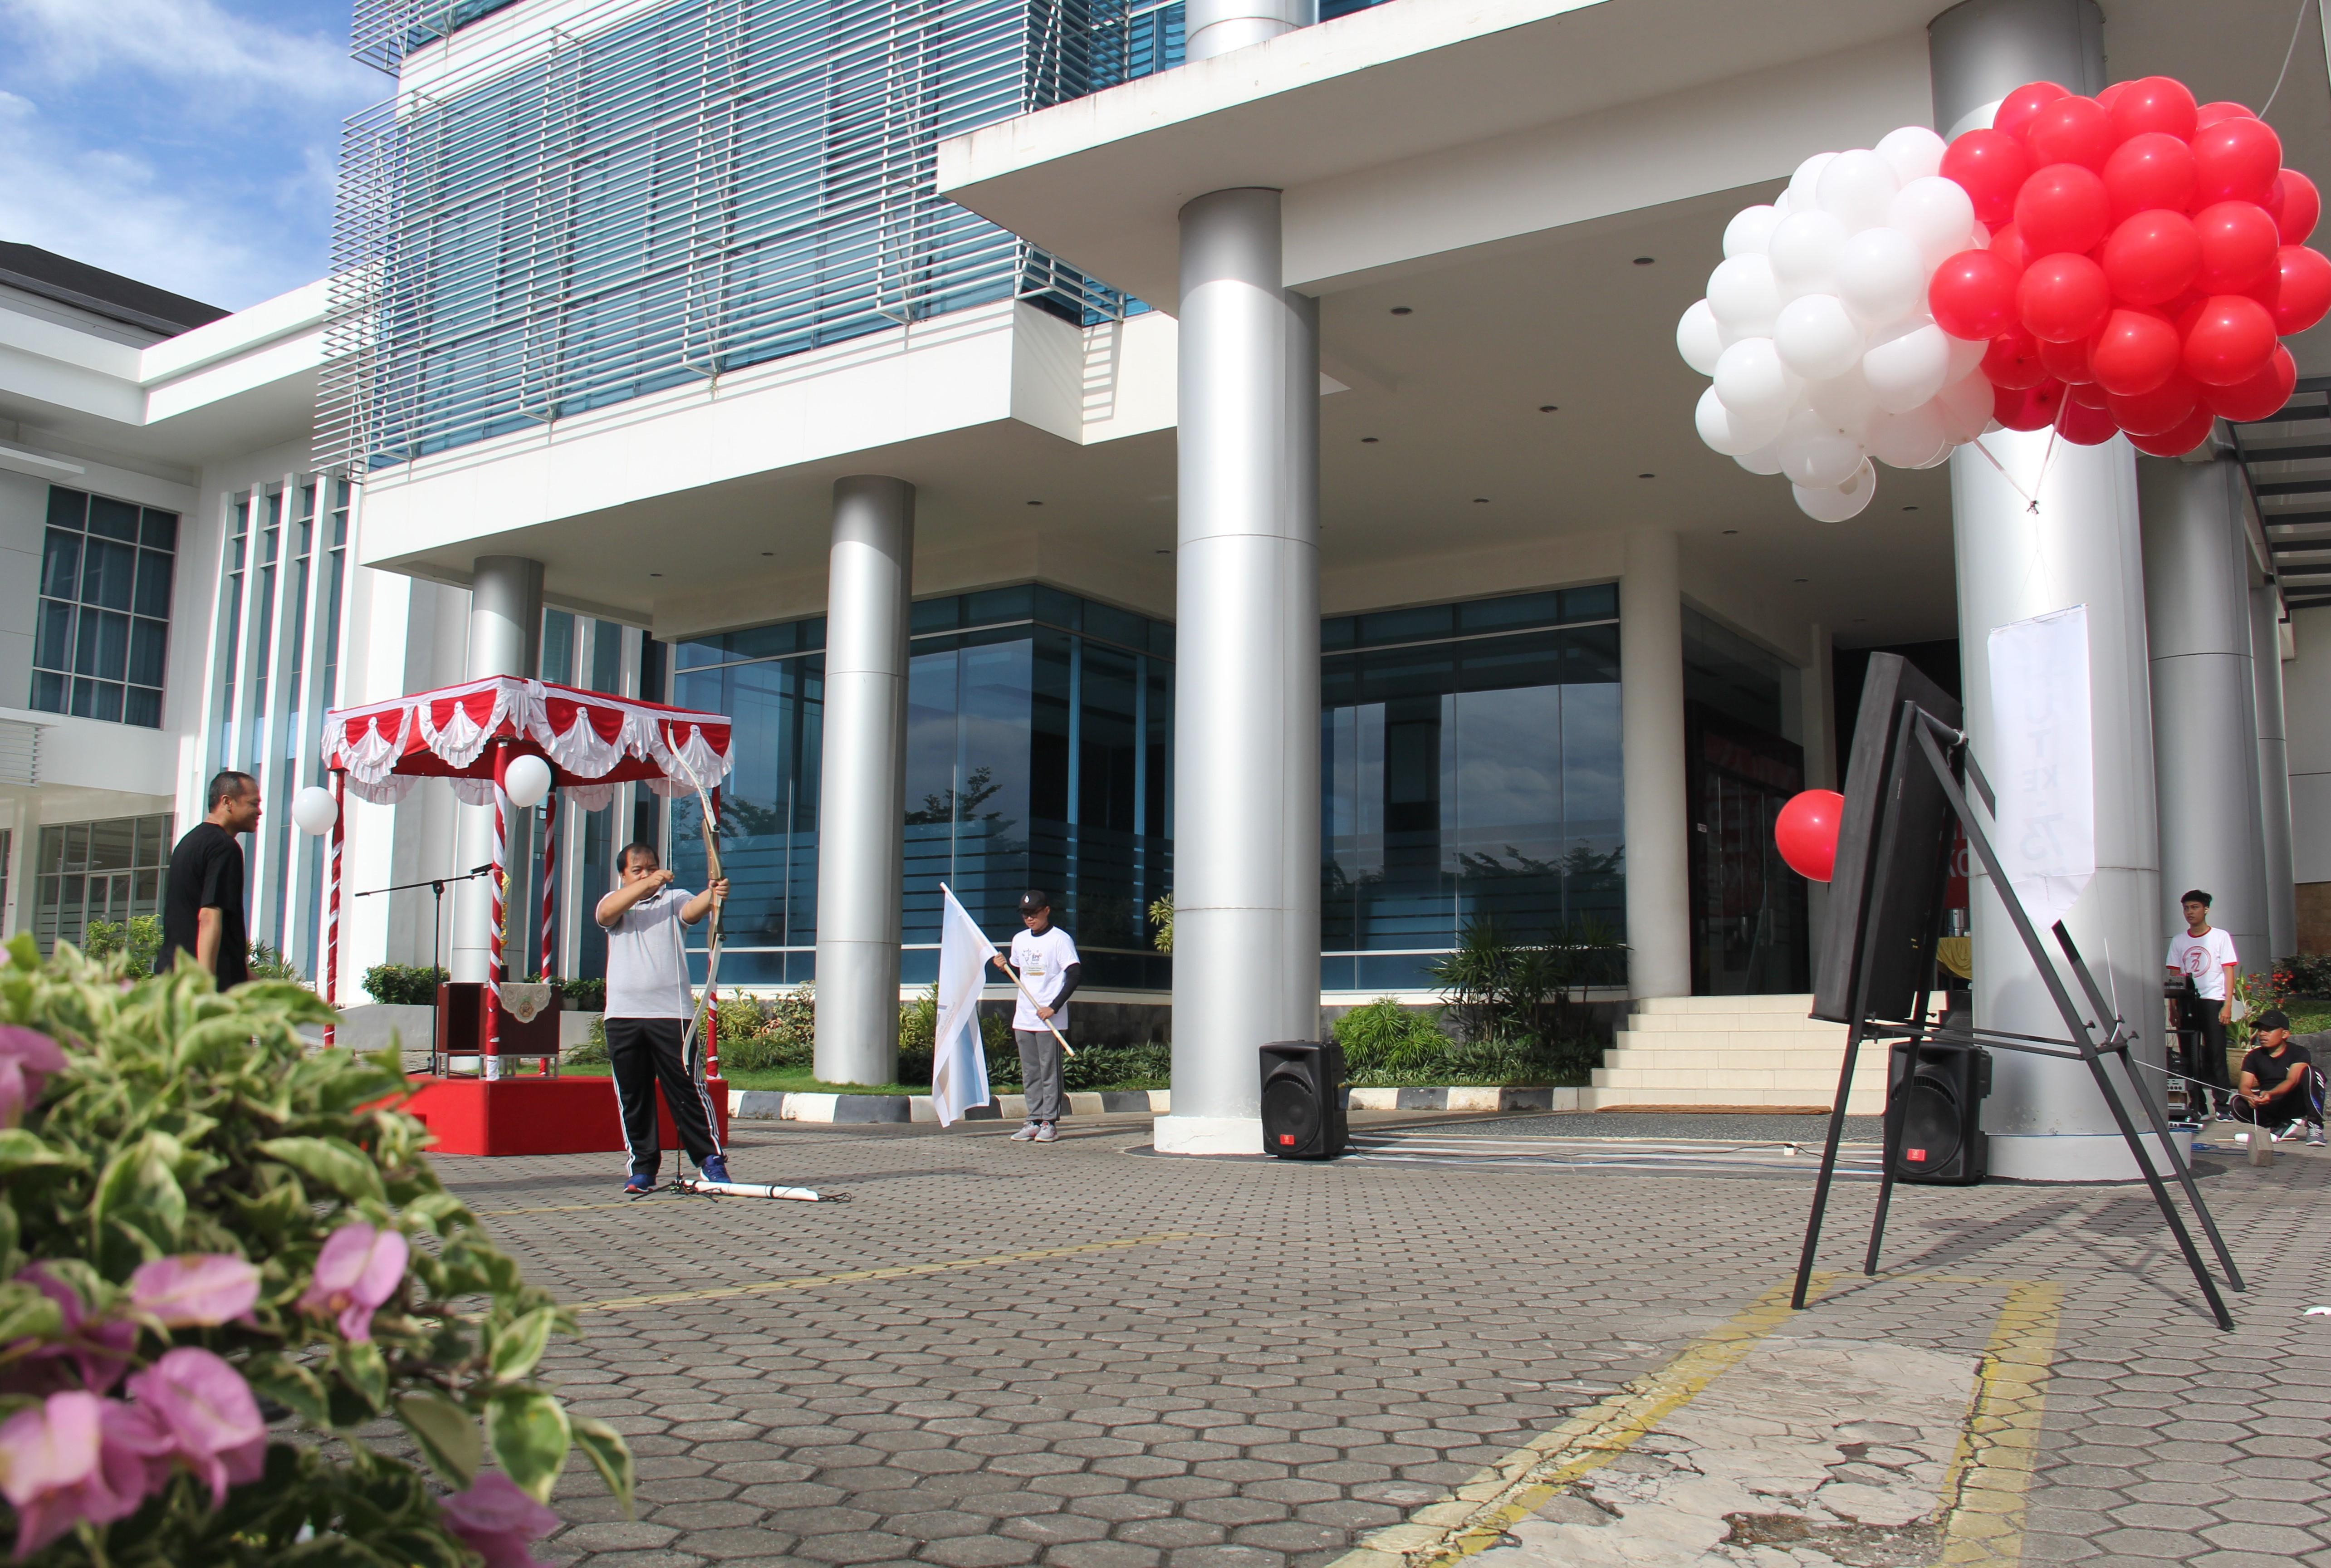 Upacara Pembukaan Pekan Olahraga dan Seni dalam rangka HUT ke-73 BPK RI di Perwakilan Provinsi Kalimantan Timur